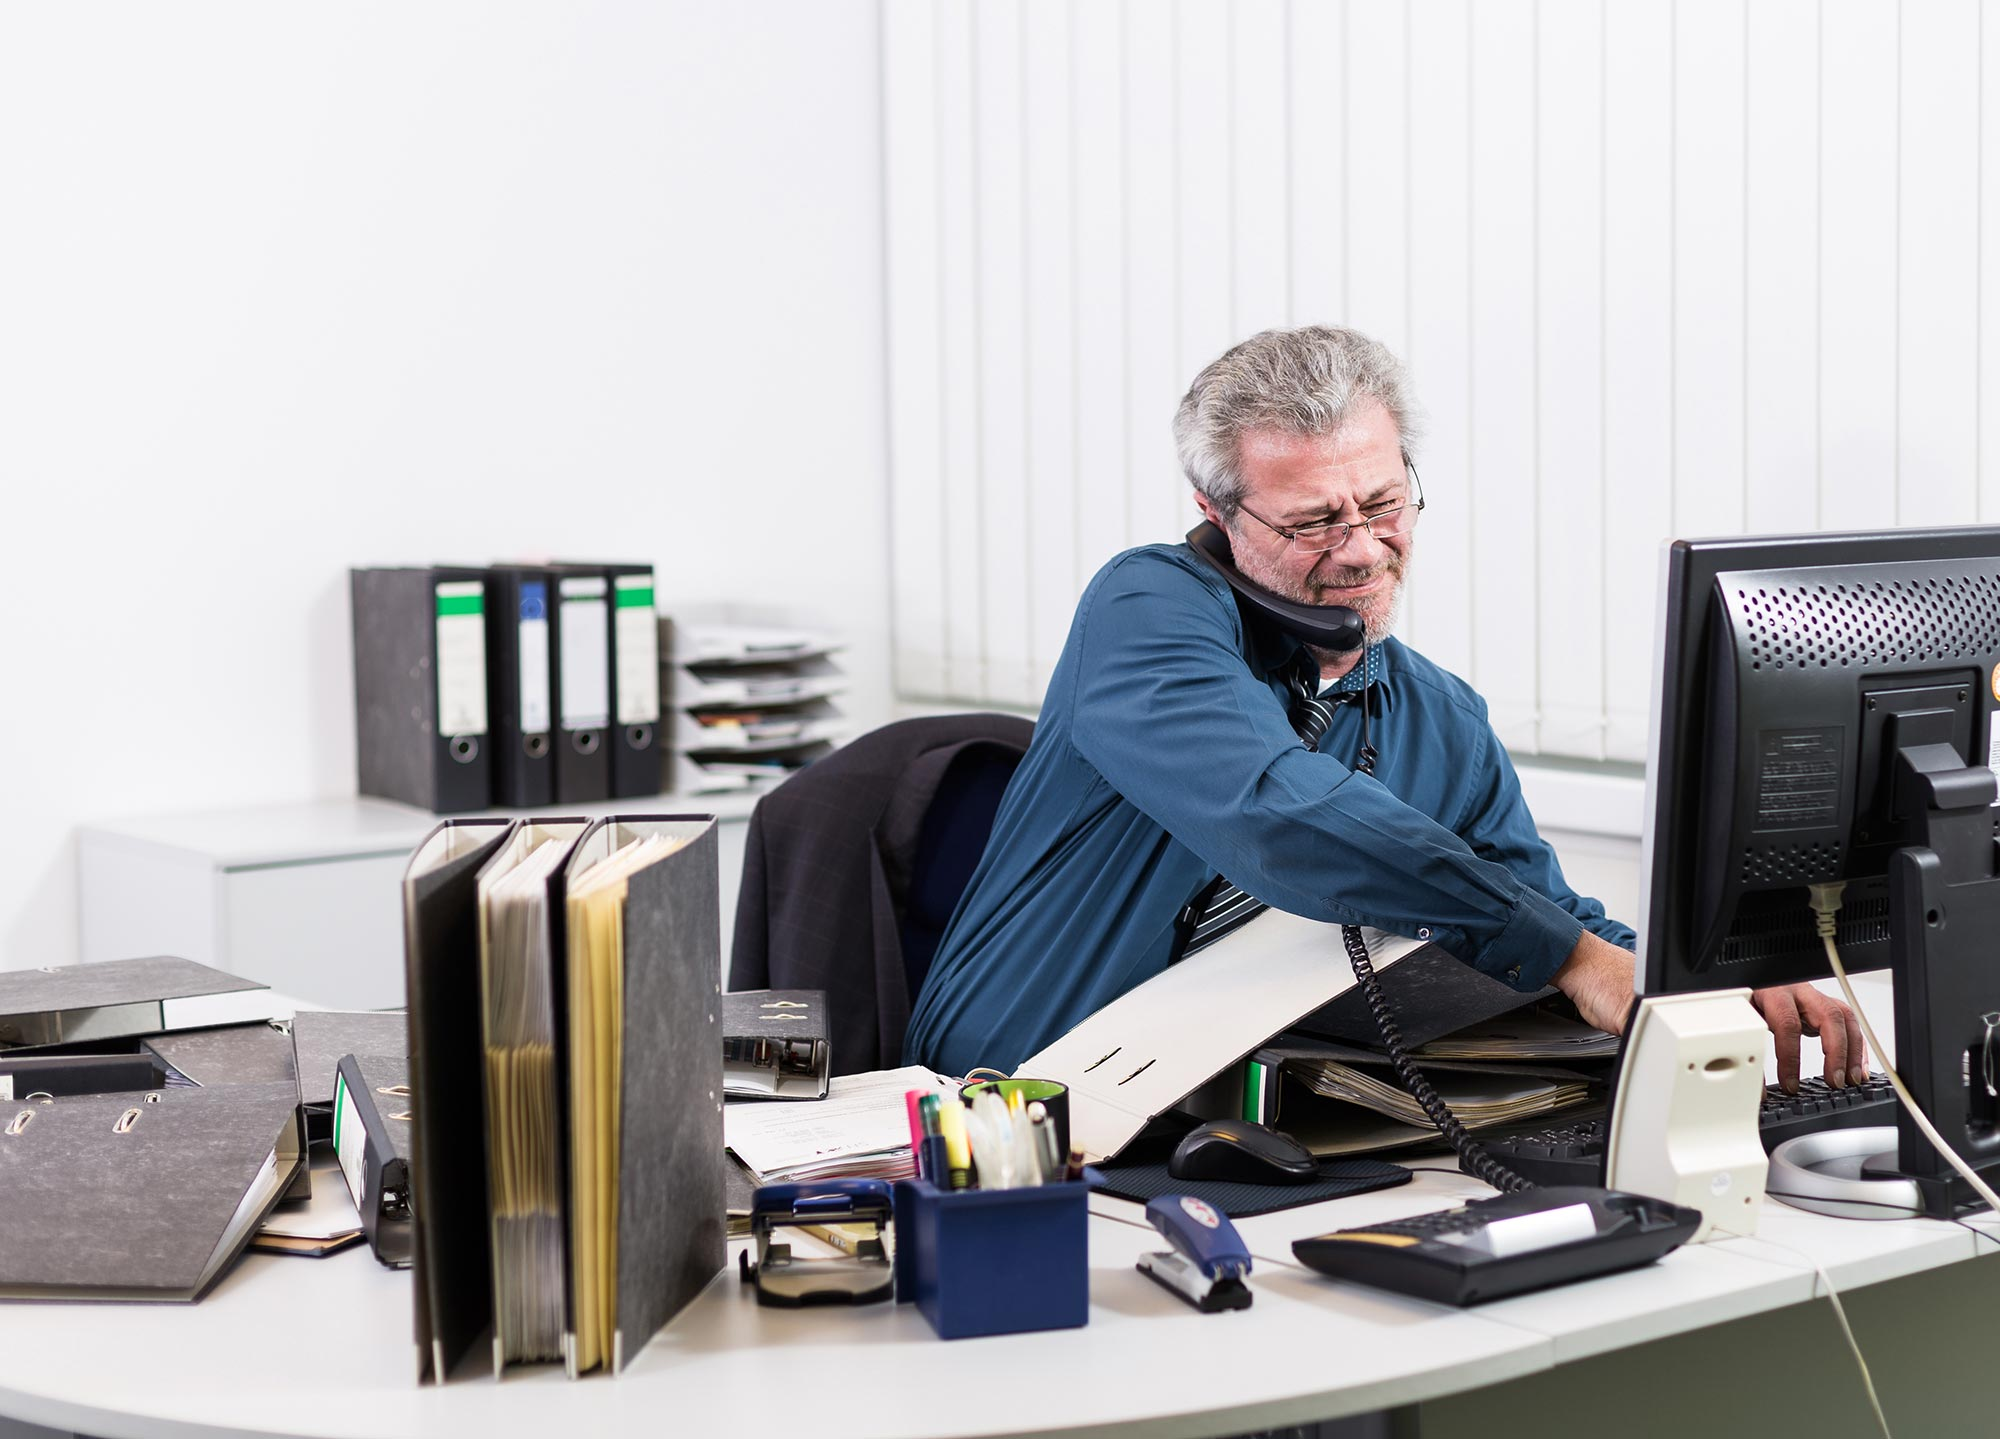 businessman-stressed-on-phone-in-office.jpg